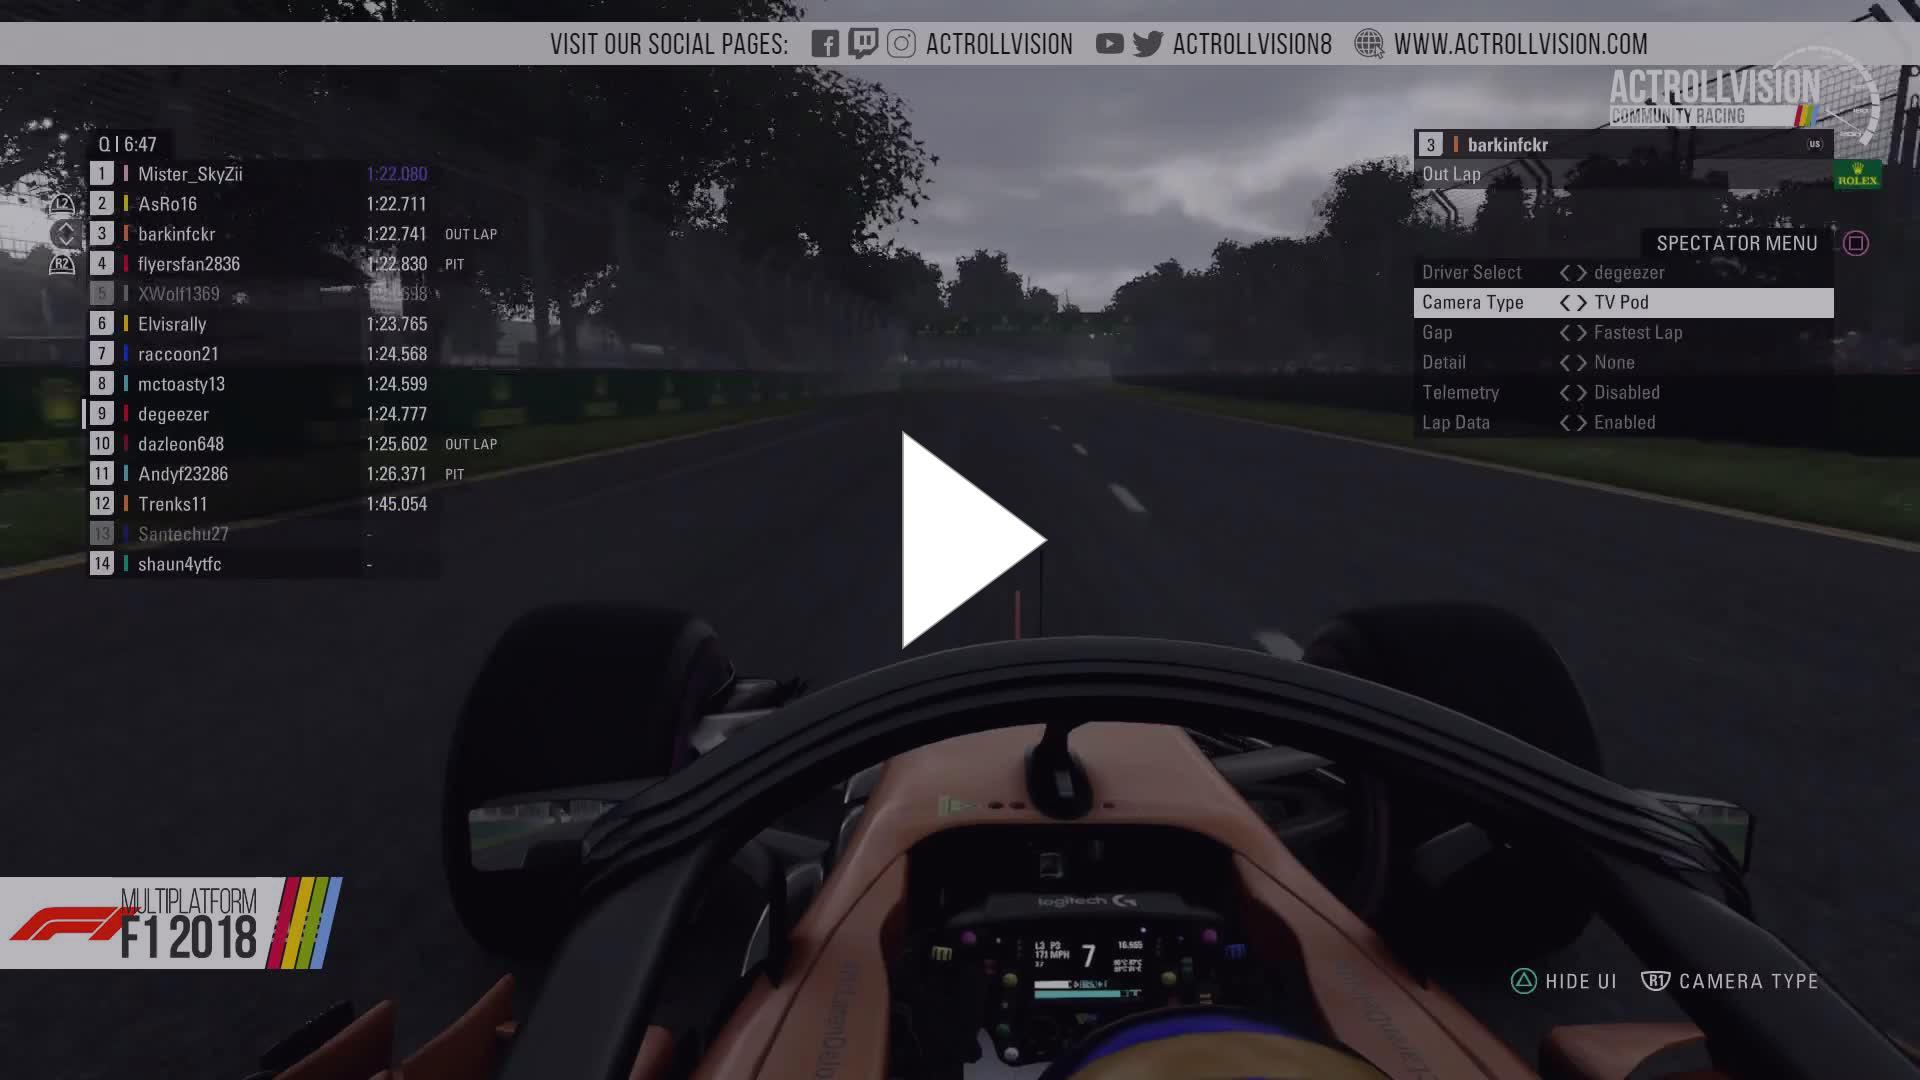 Actrollvision - ACR Formula 1 2018 season 2 Round 1 (Pre